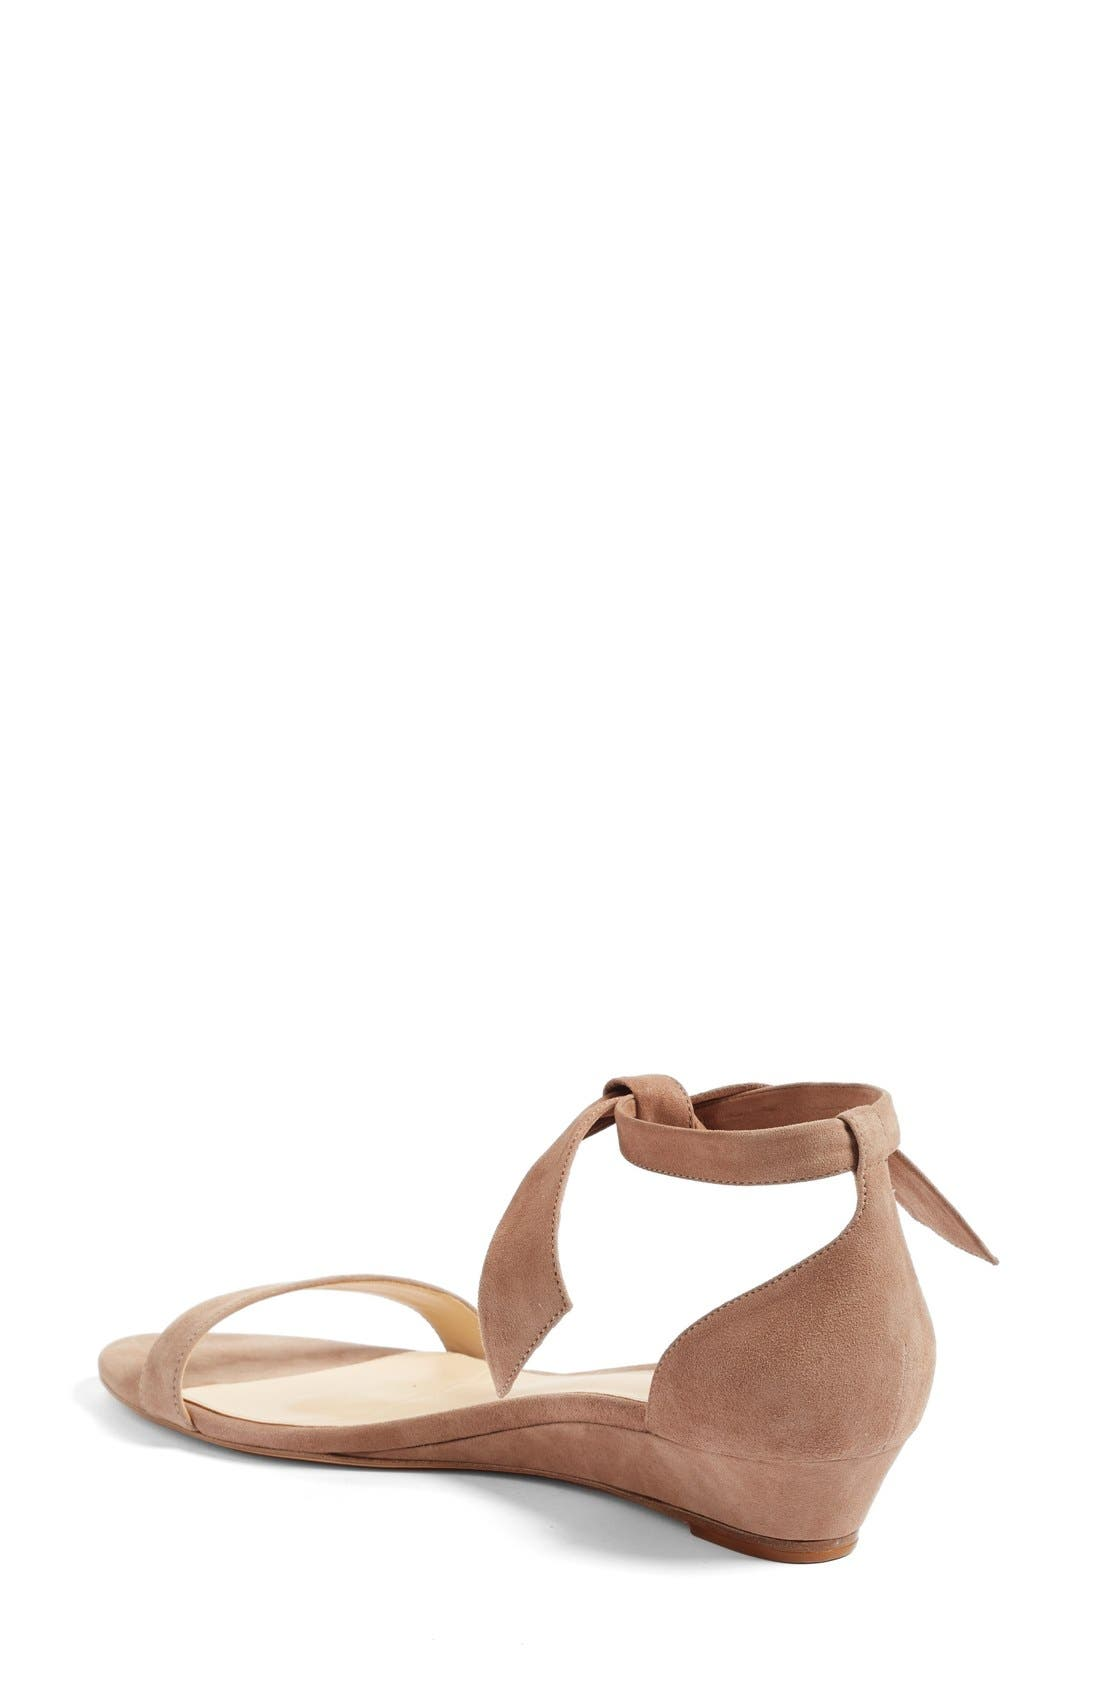 Alternate Image 2  - Alexandre Birman Atena Tie Strap Wedge Sandal (Women)